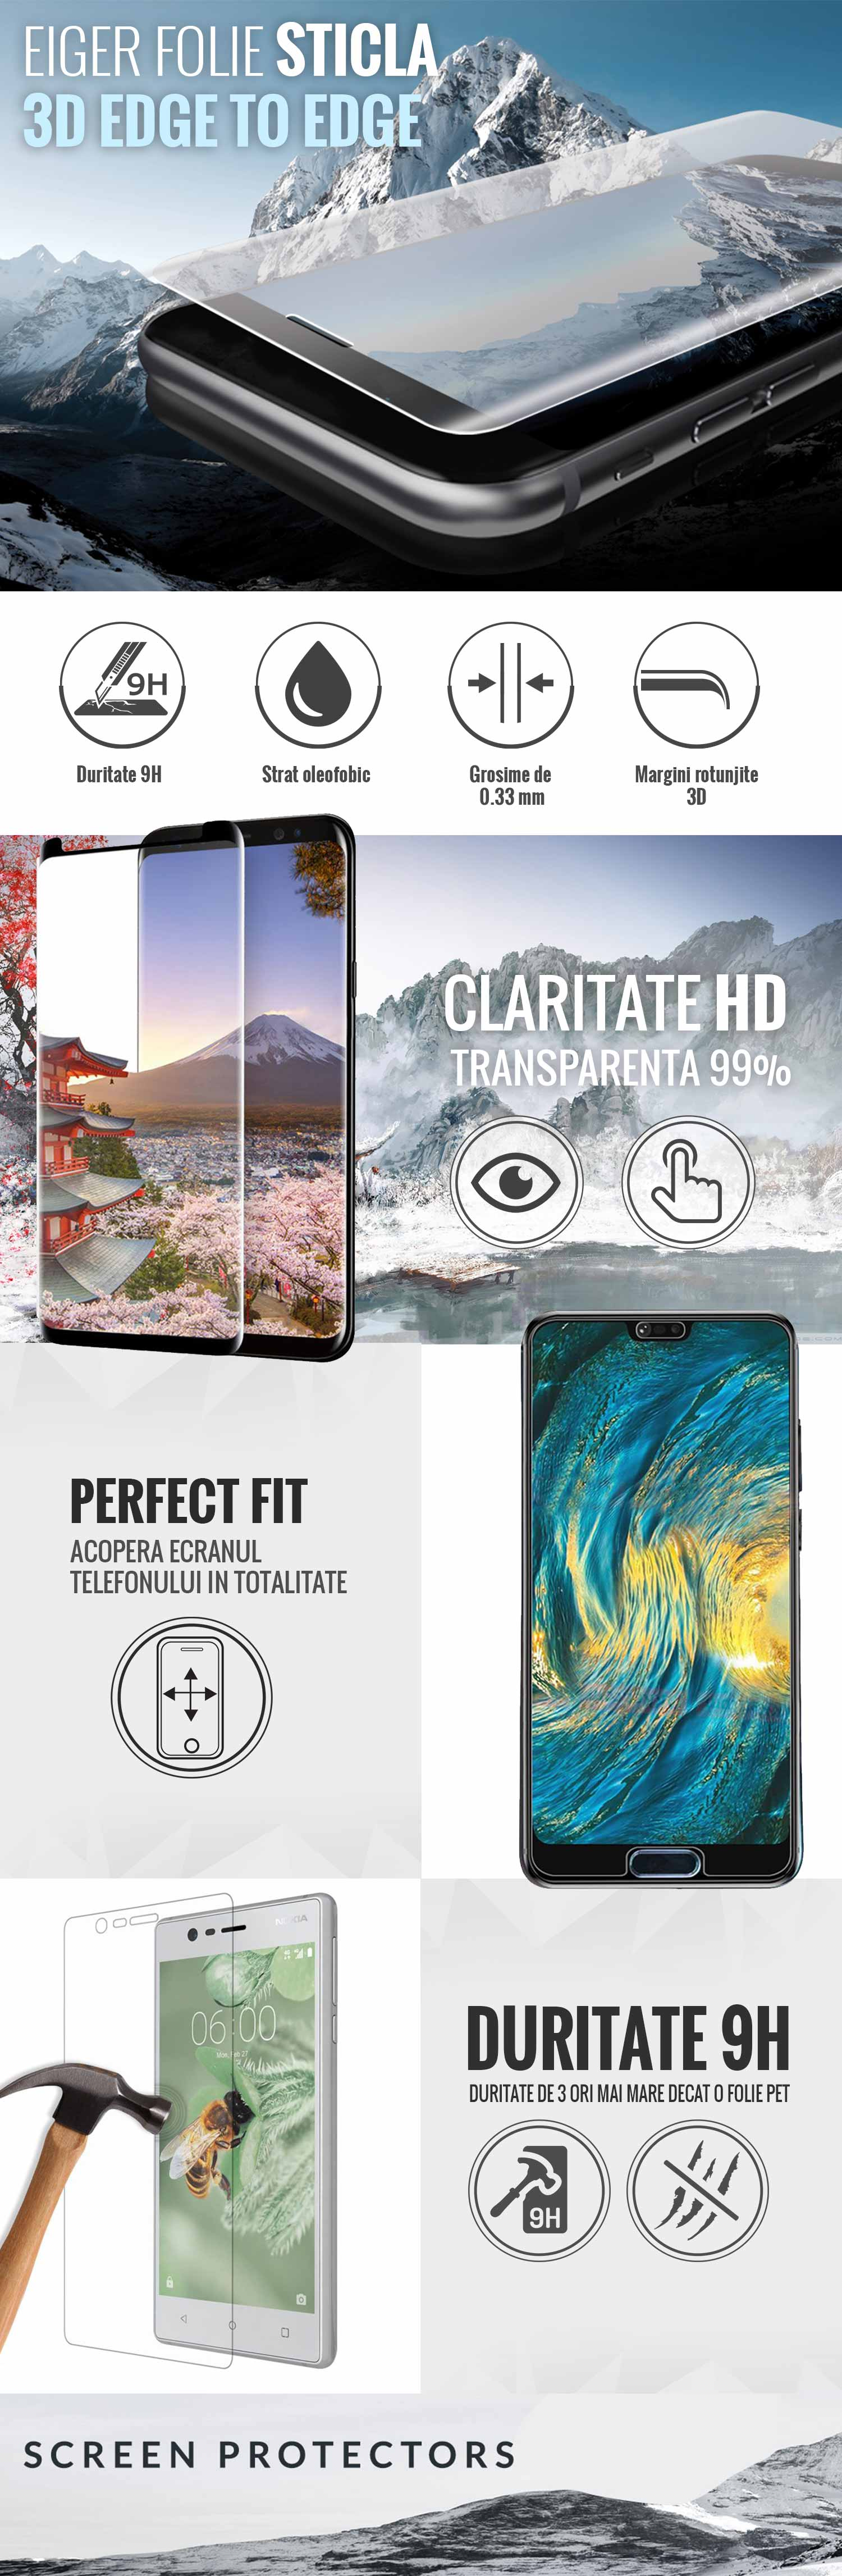 Folie Huawei P20 Lite